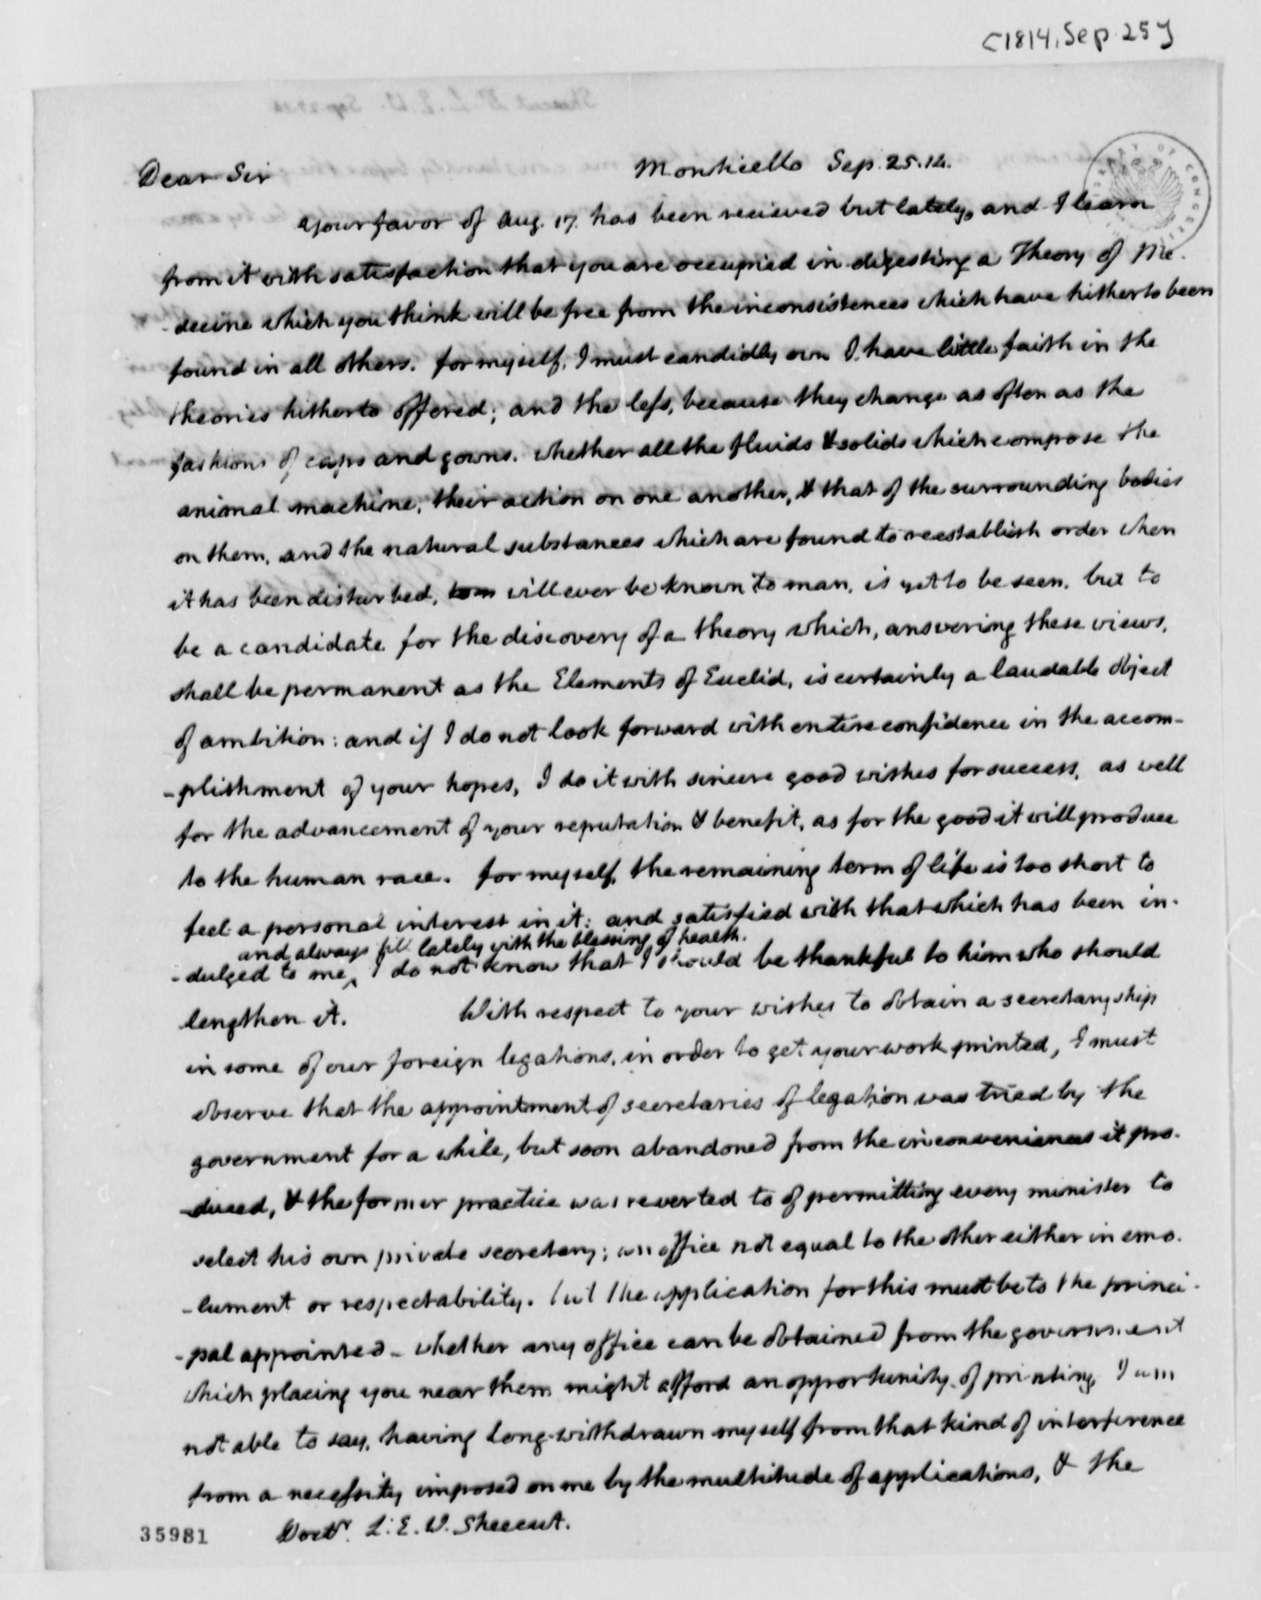 Thomas Jefferson to John L. E. W. Shecut, September 25, 1814